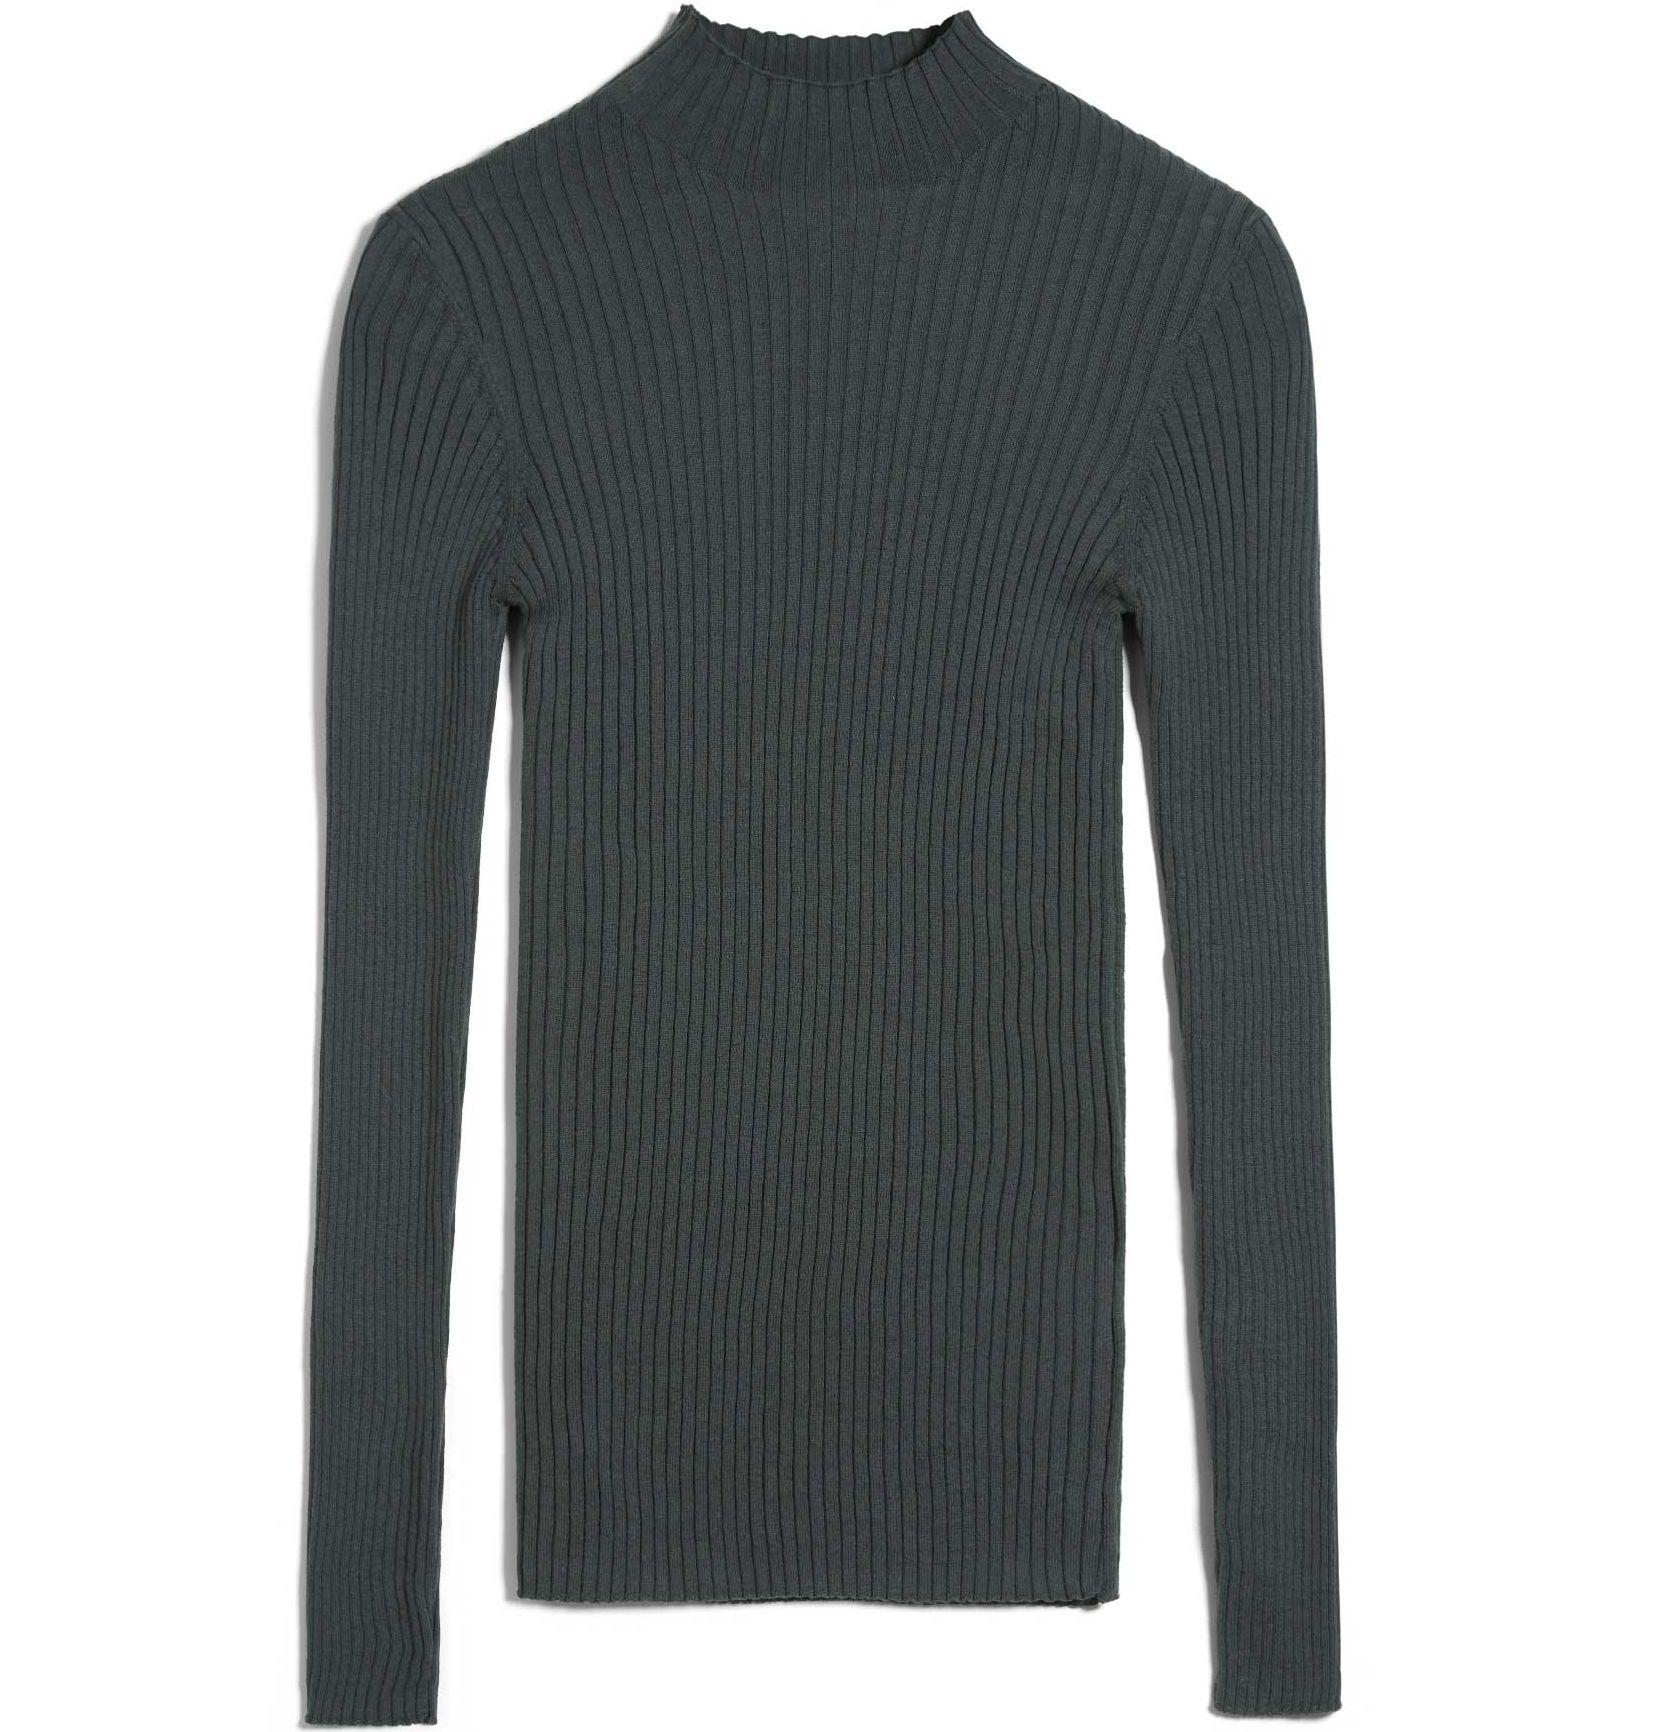 Damen-Pullover ALAANI vintage green